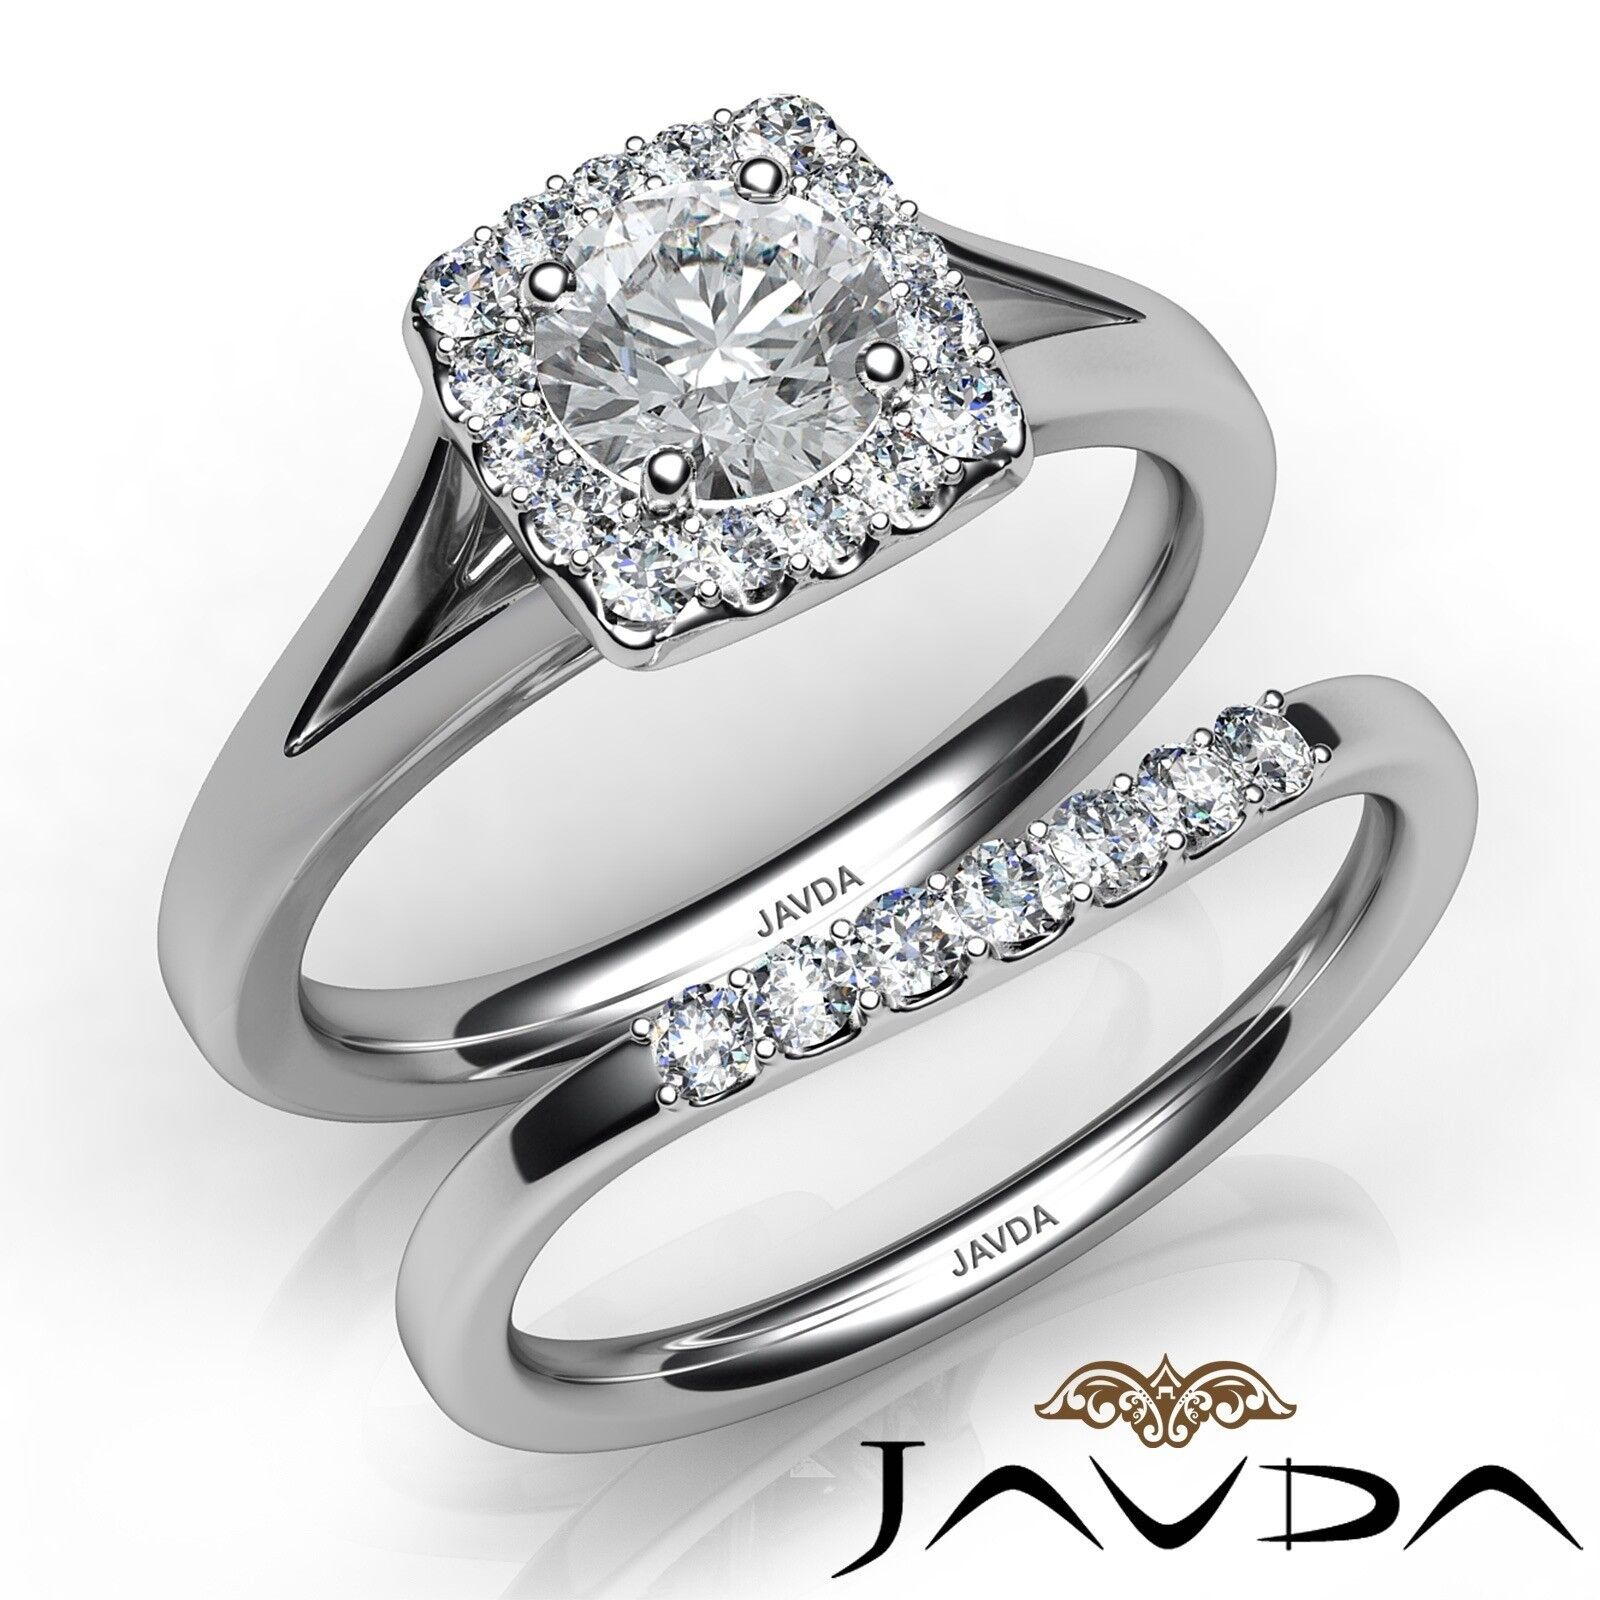 1.12ct Halo Side Stone Bridal Set Round Diamond Engagement Ring GIA G-VS1 W Gold